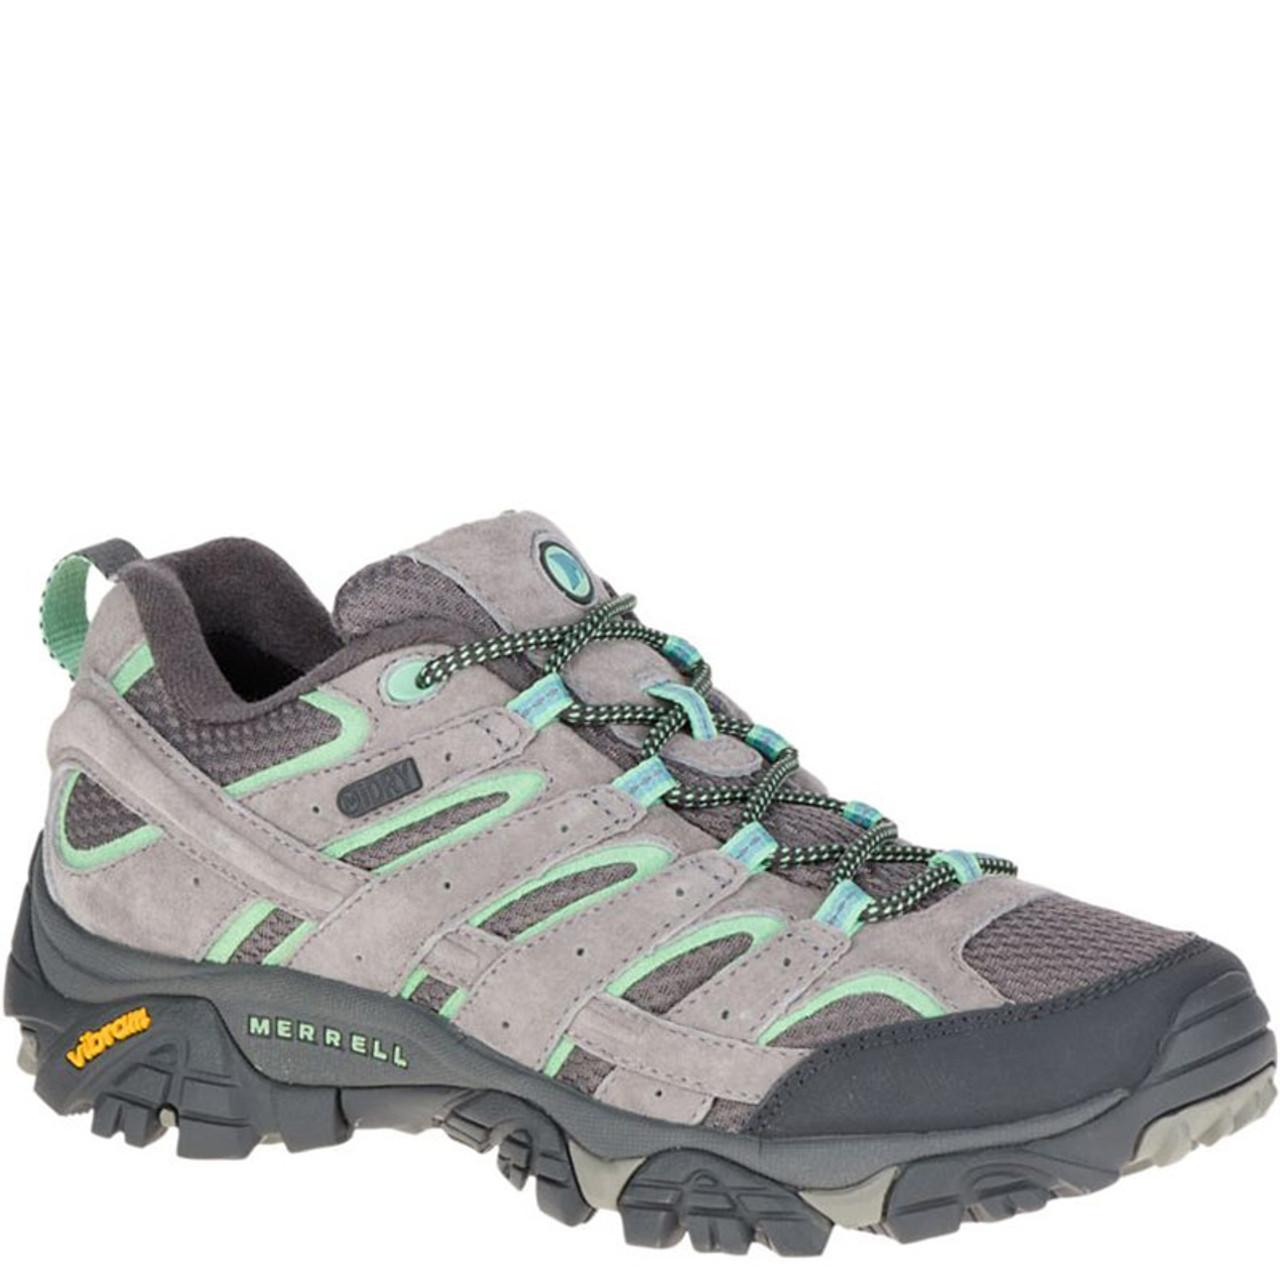 9c09235be7 Merrell J06028 Women's MOAB 2 Waterproof Hiking Shoes Drizzle Mint